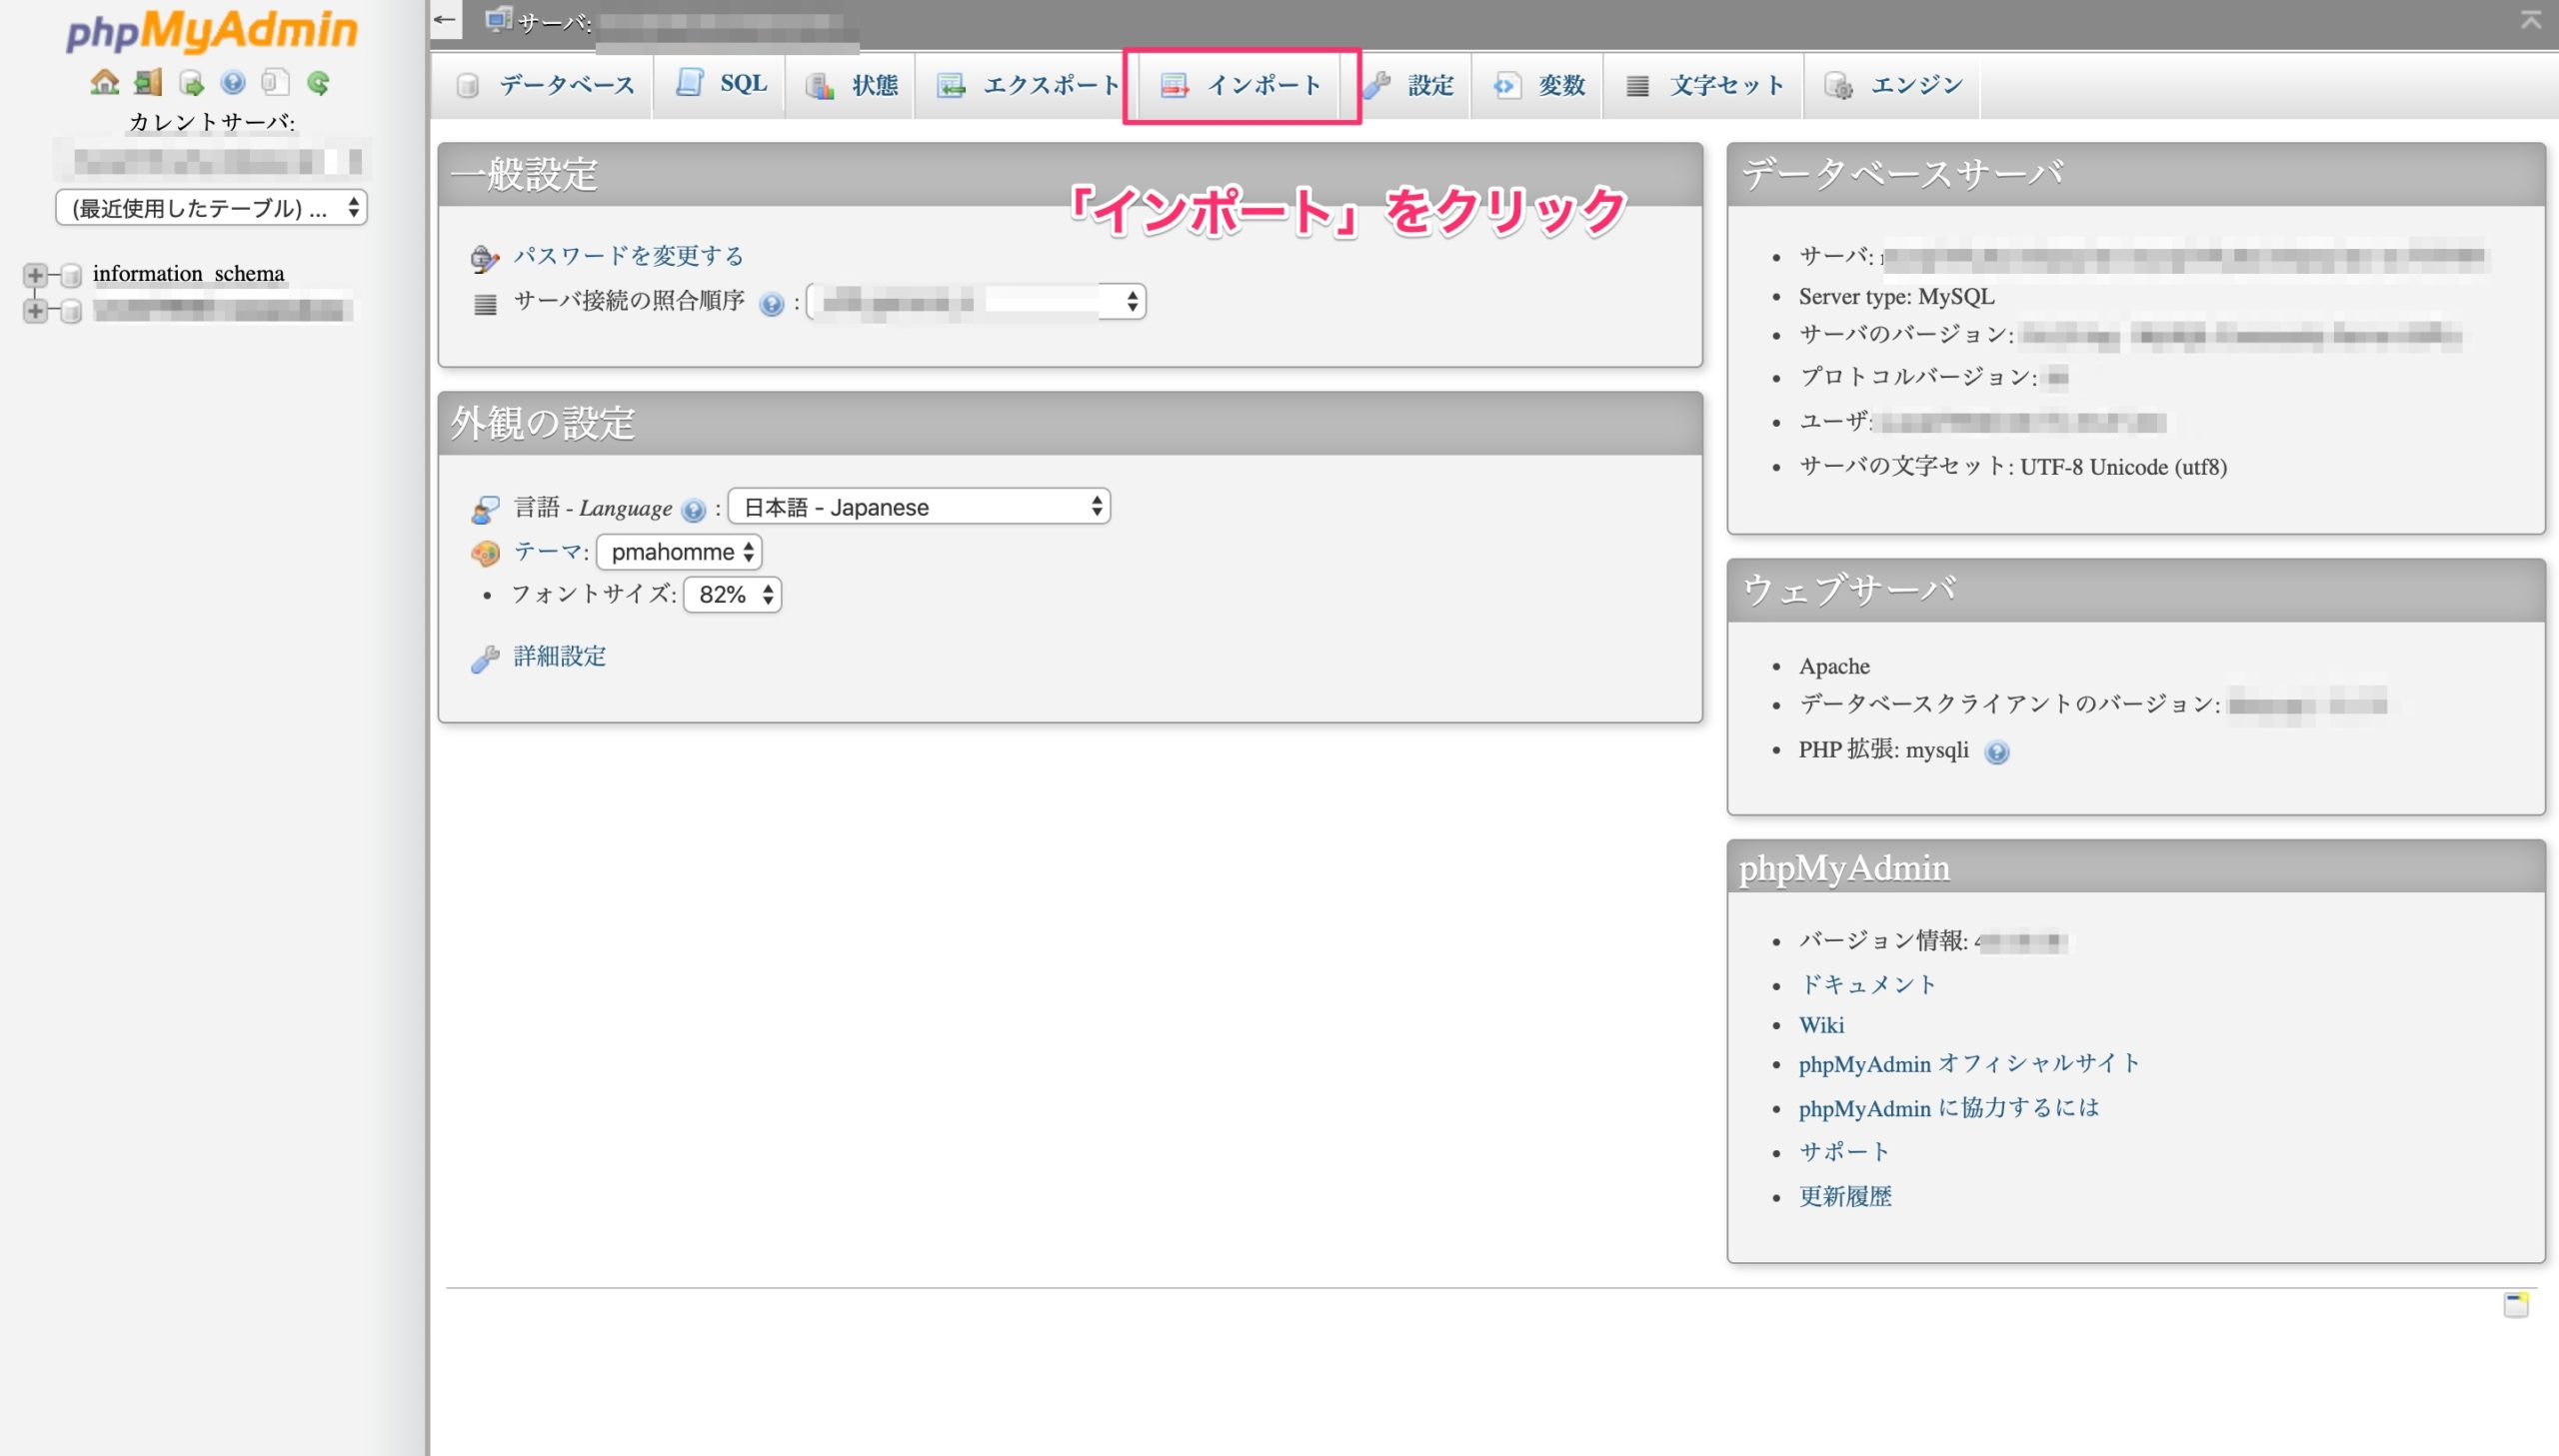 phpMyAdmin インポートボタン